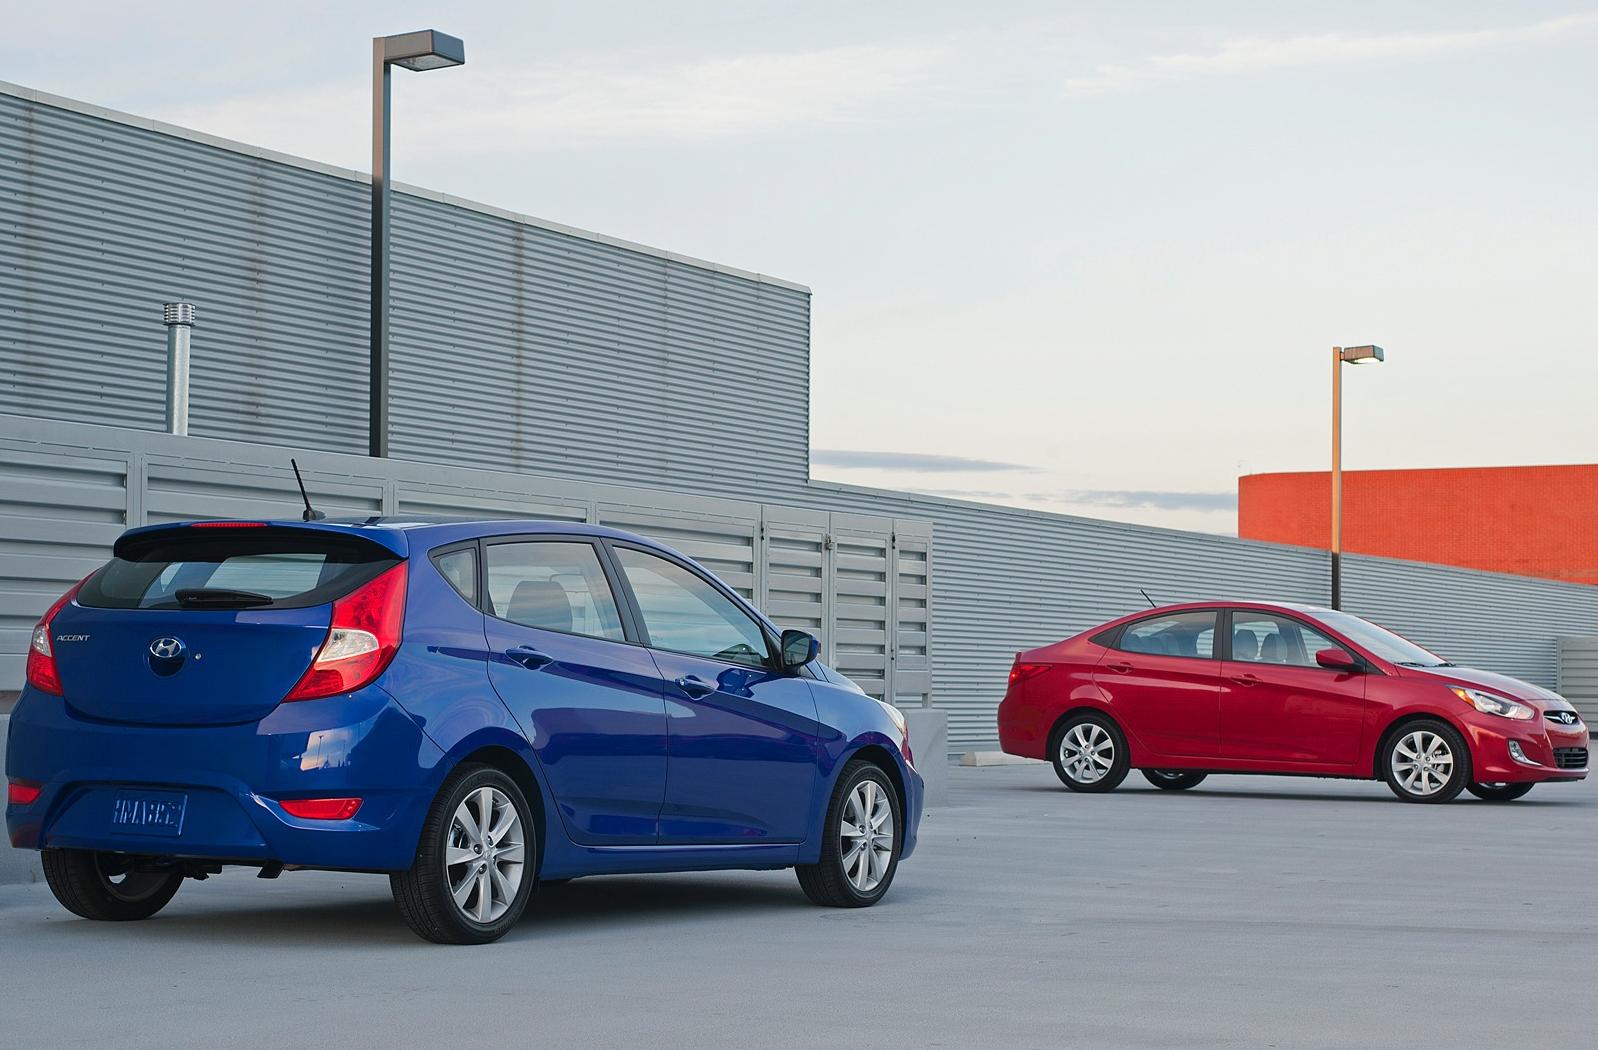 Hyundai Accent 2012mpg >> 2012 Hyundai Accent Pictures Price Specs And Fuel Economy